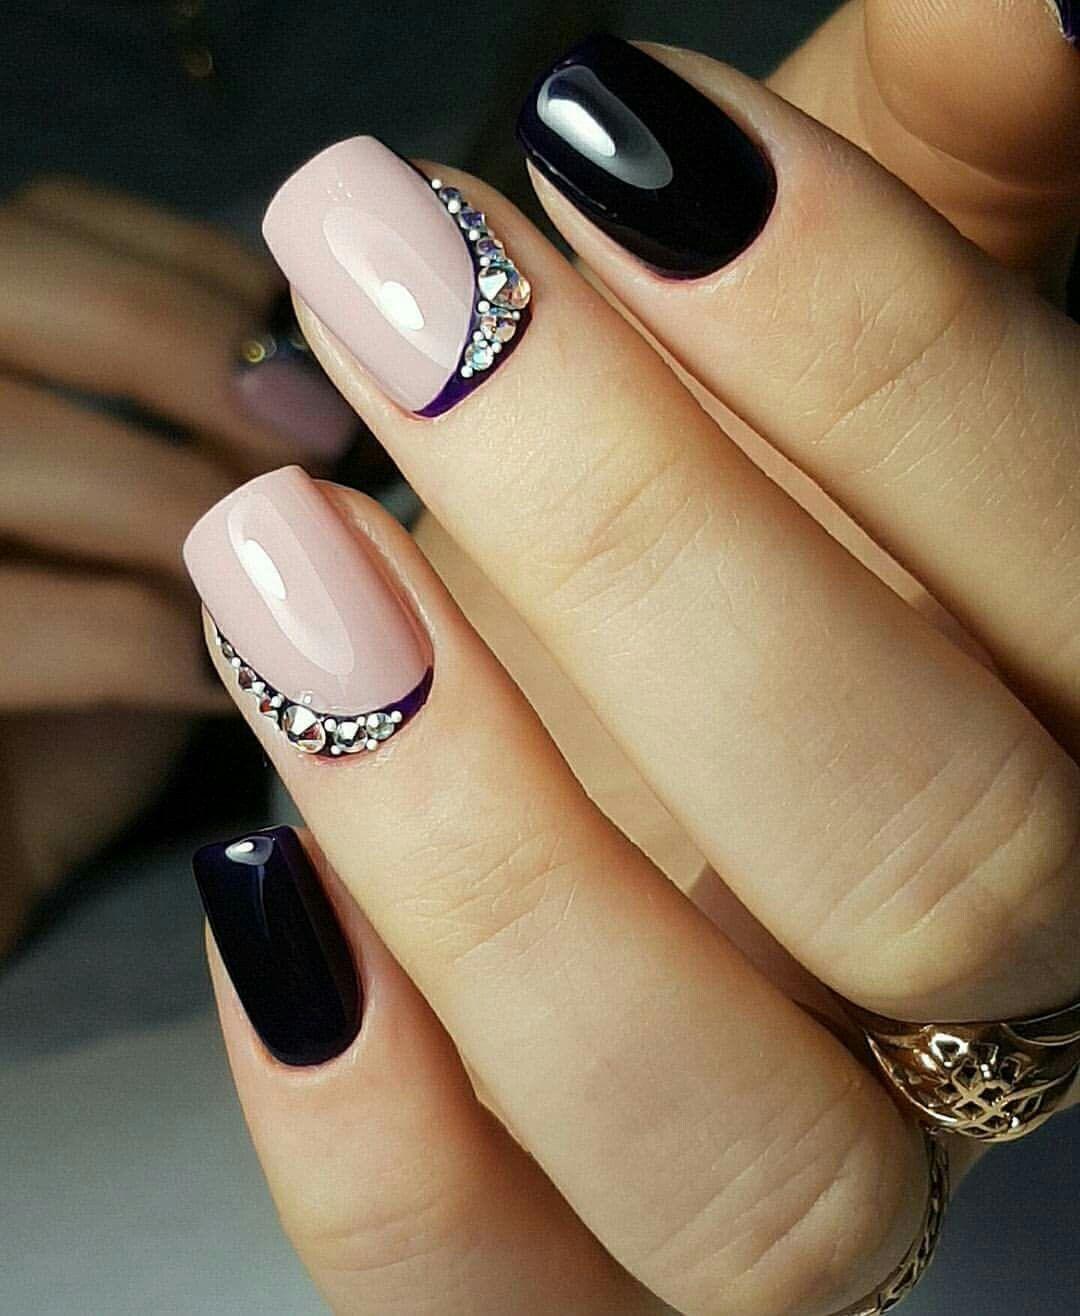 Pin By Elizabeth Munoz On Nail Love Pinterest Manicure Mani